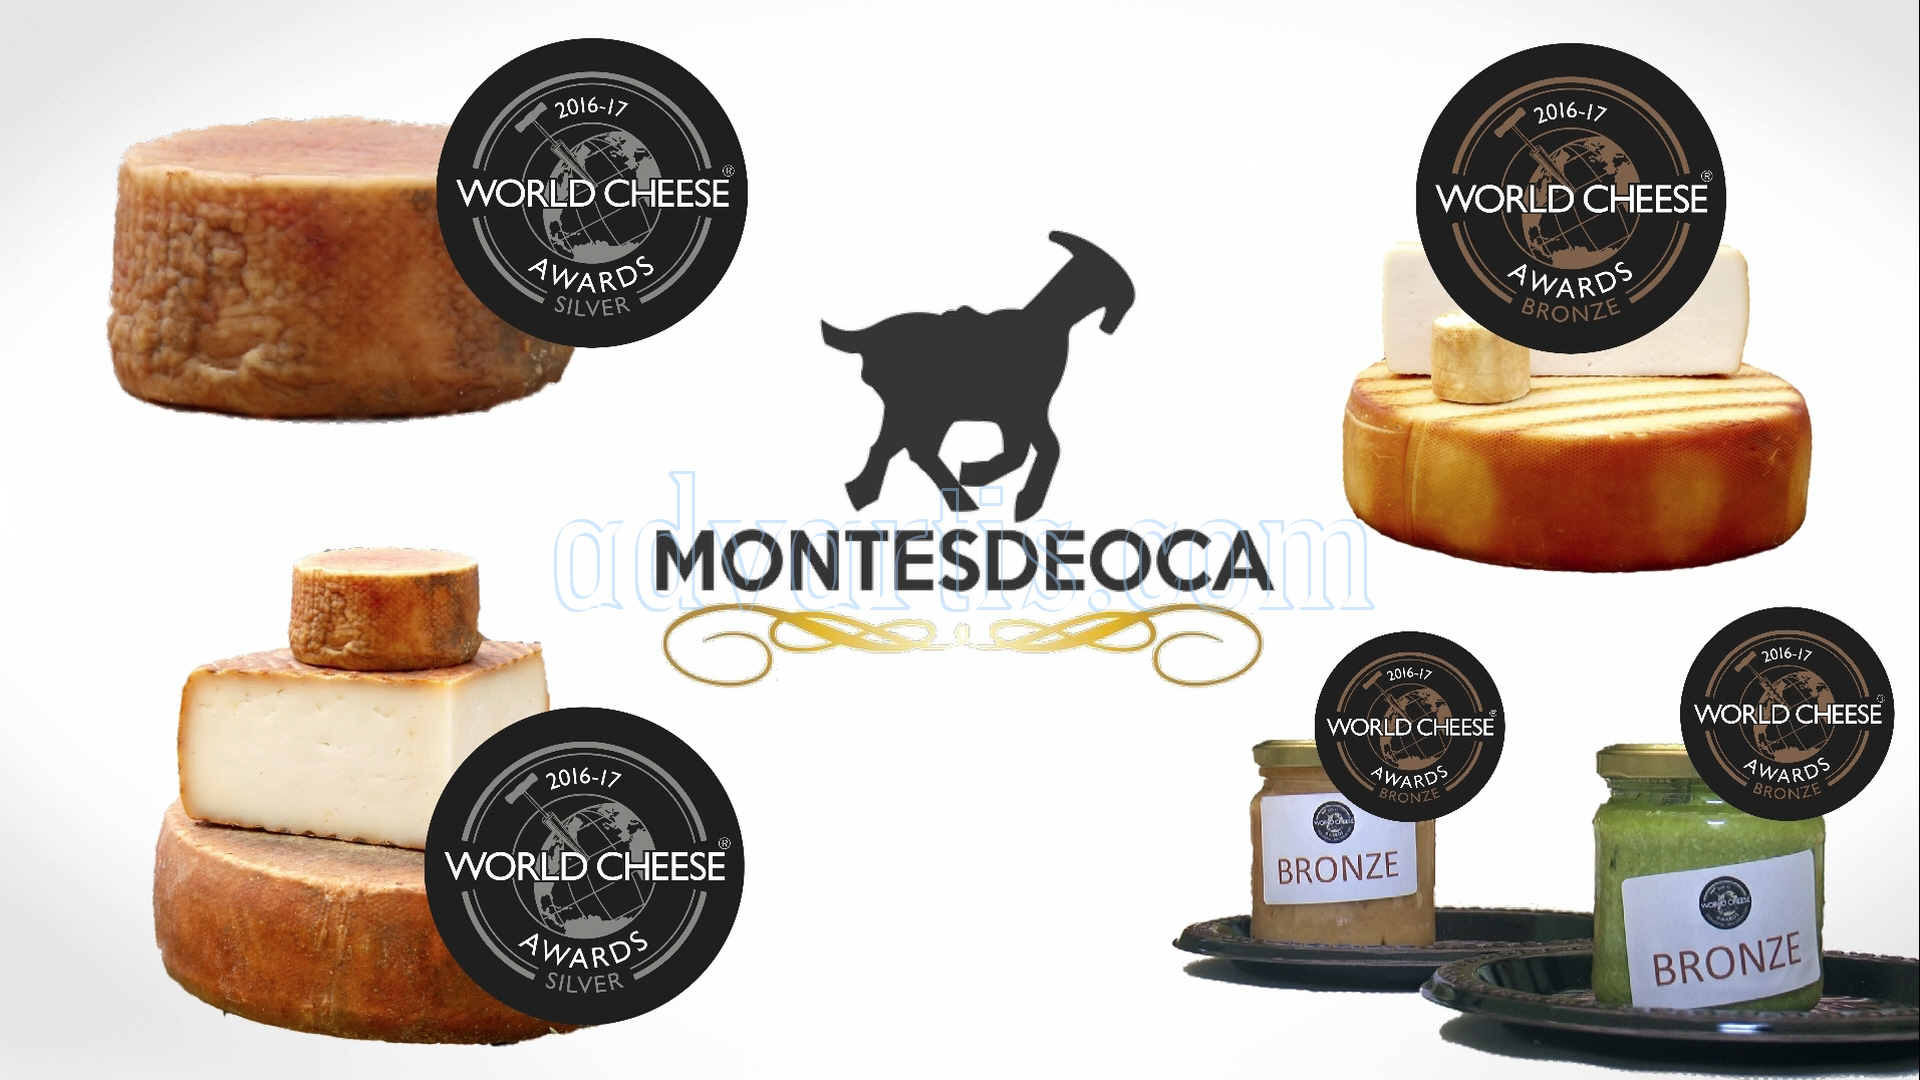 The Montesdeoca Artisan Cheese Factory. Km. 44 TF-82, Tijoco Bajo – S/C de Tenerife